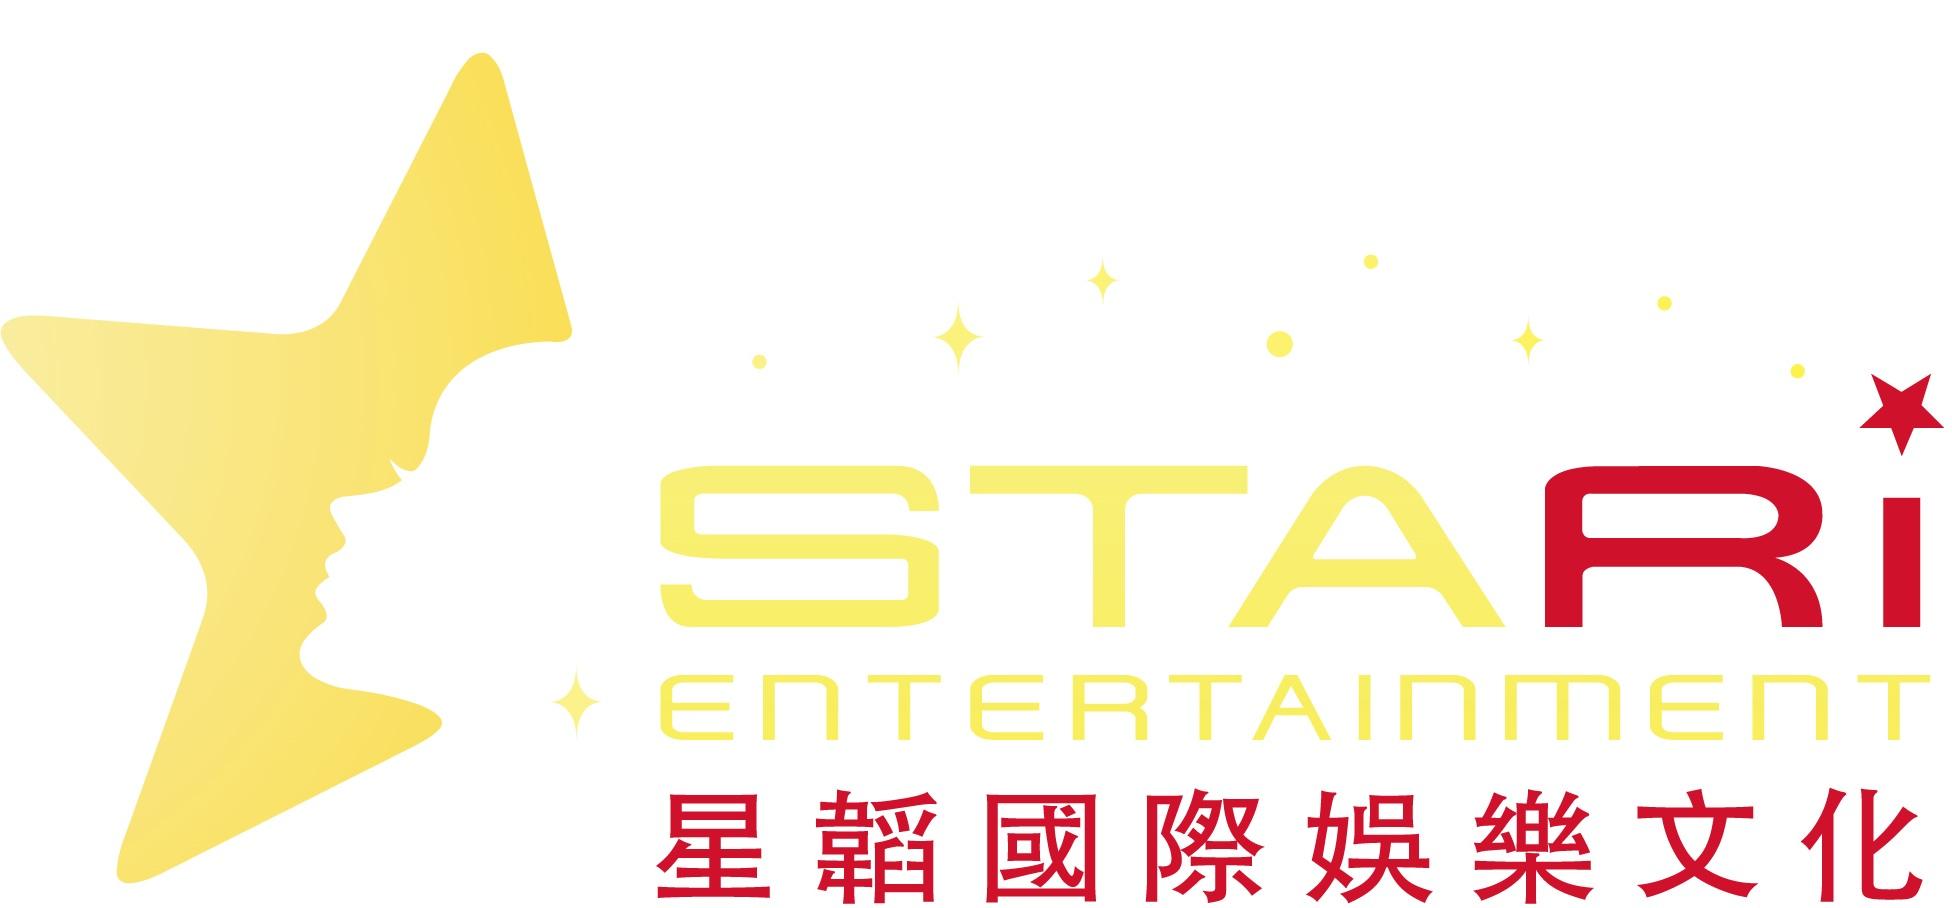 StaRi | 簡體中文 | 星韜國際娛樂文化